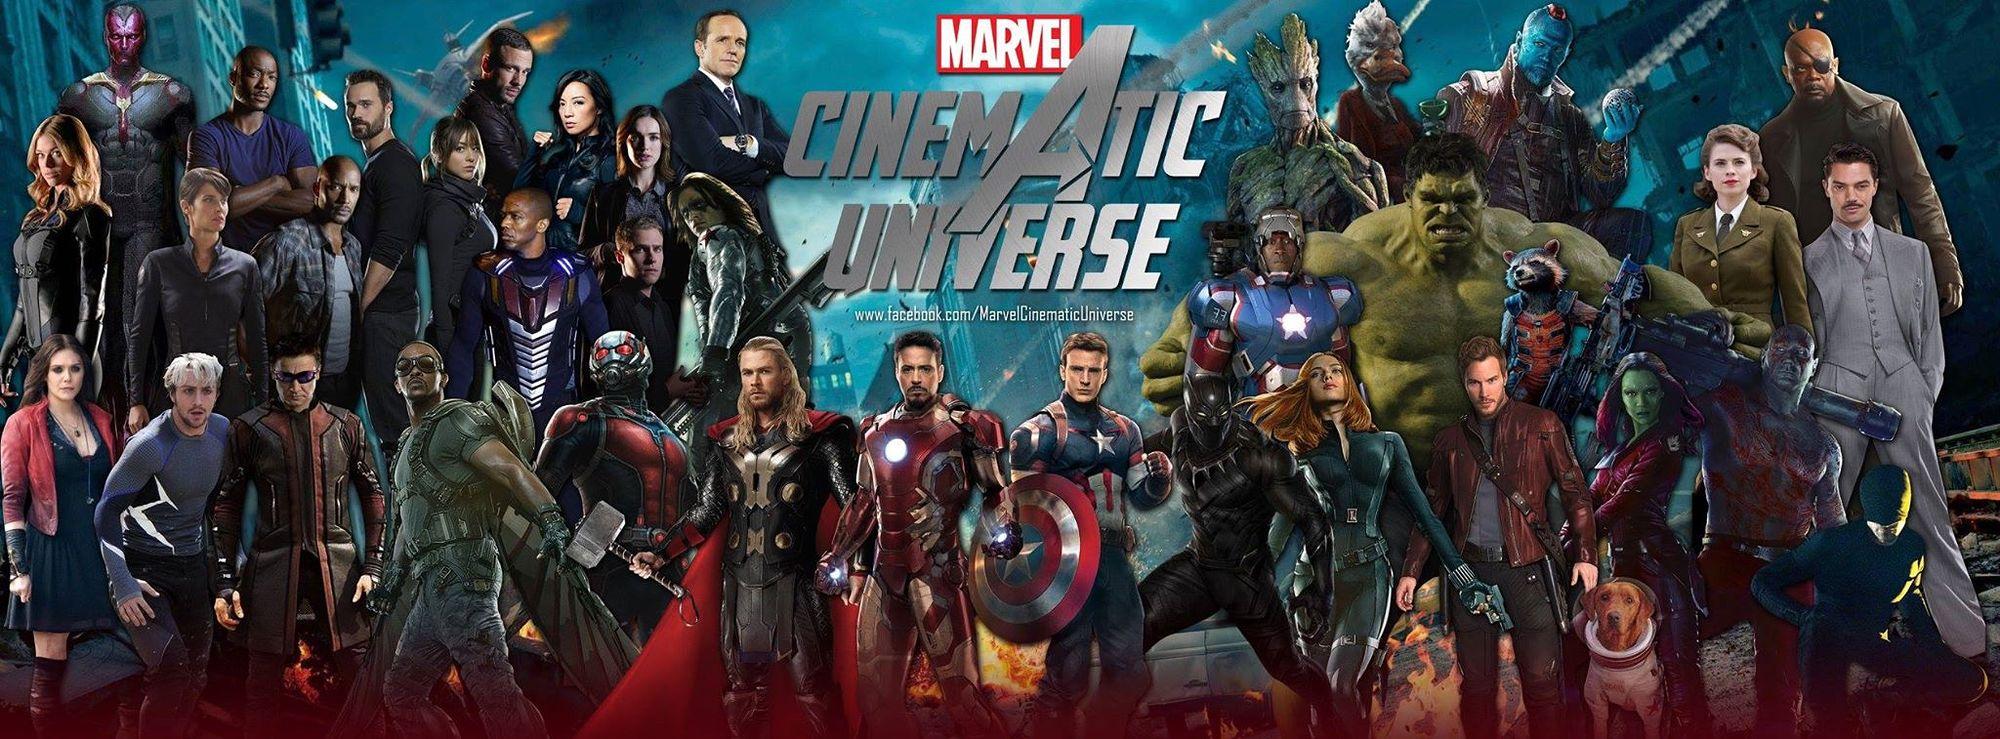 Marvel-Cinematic-Universe.jpg